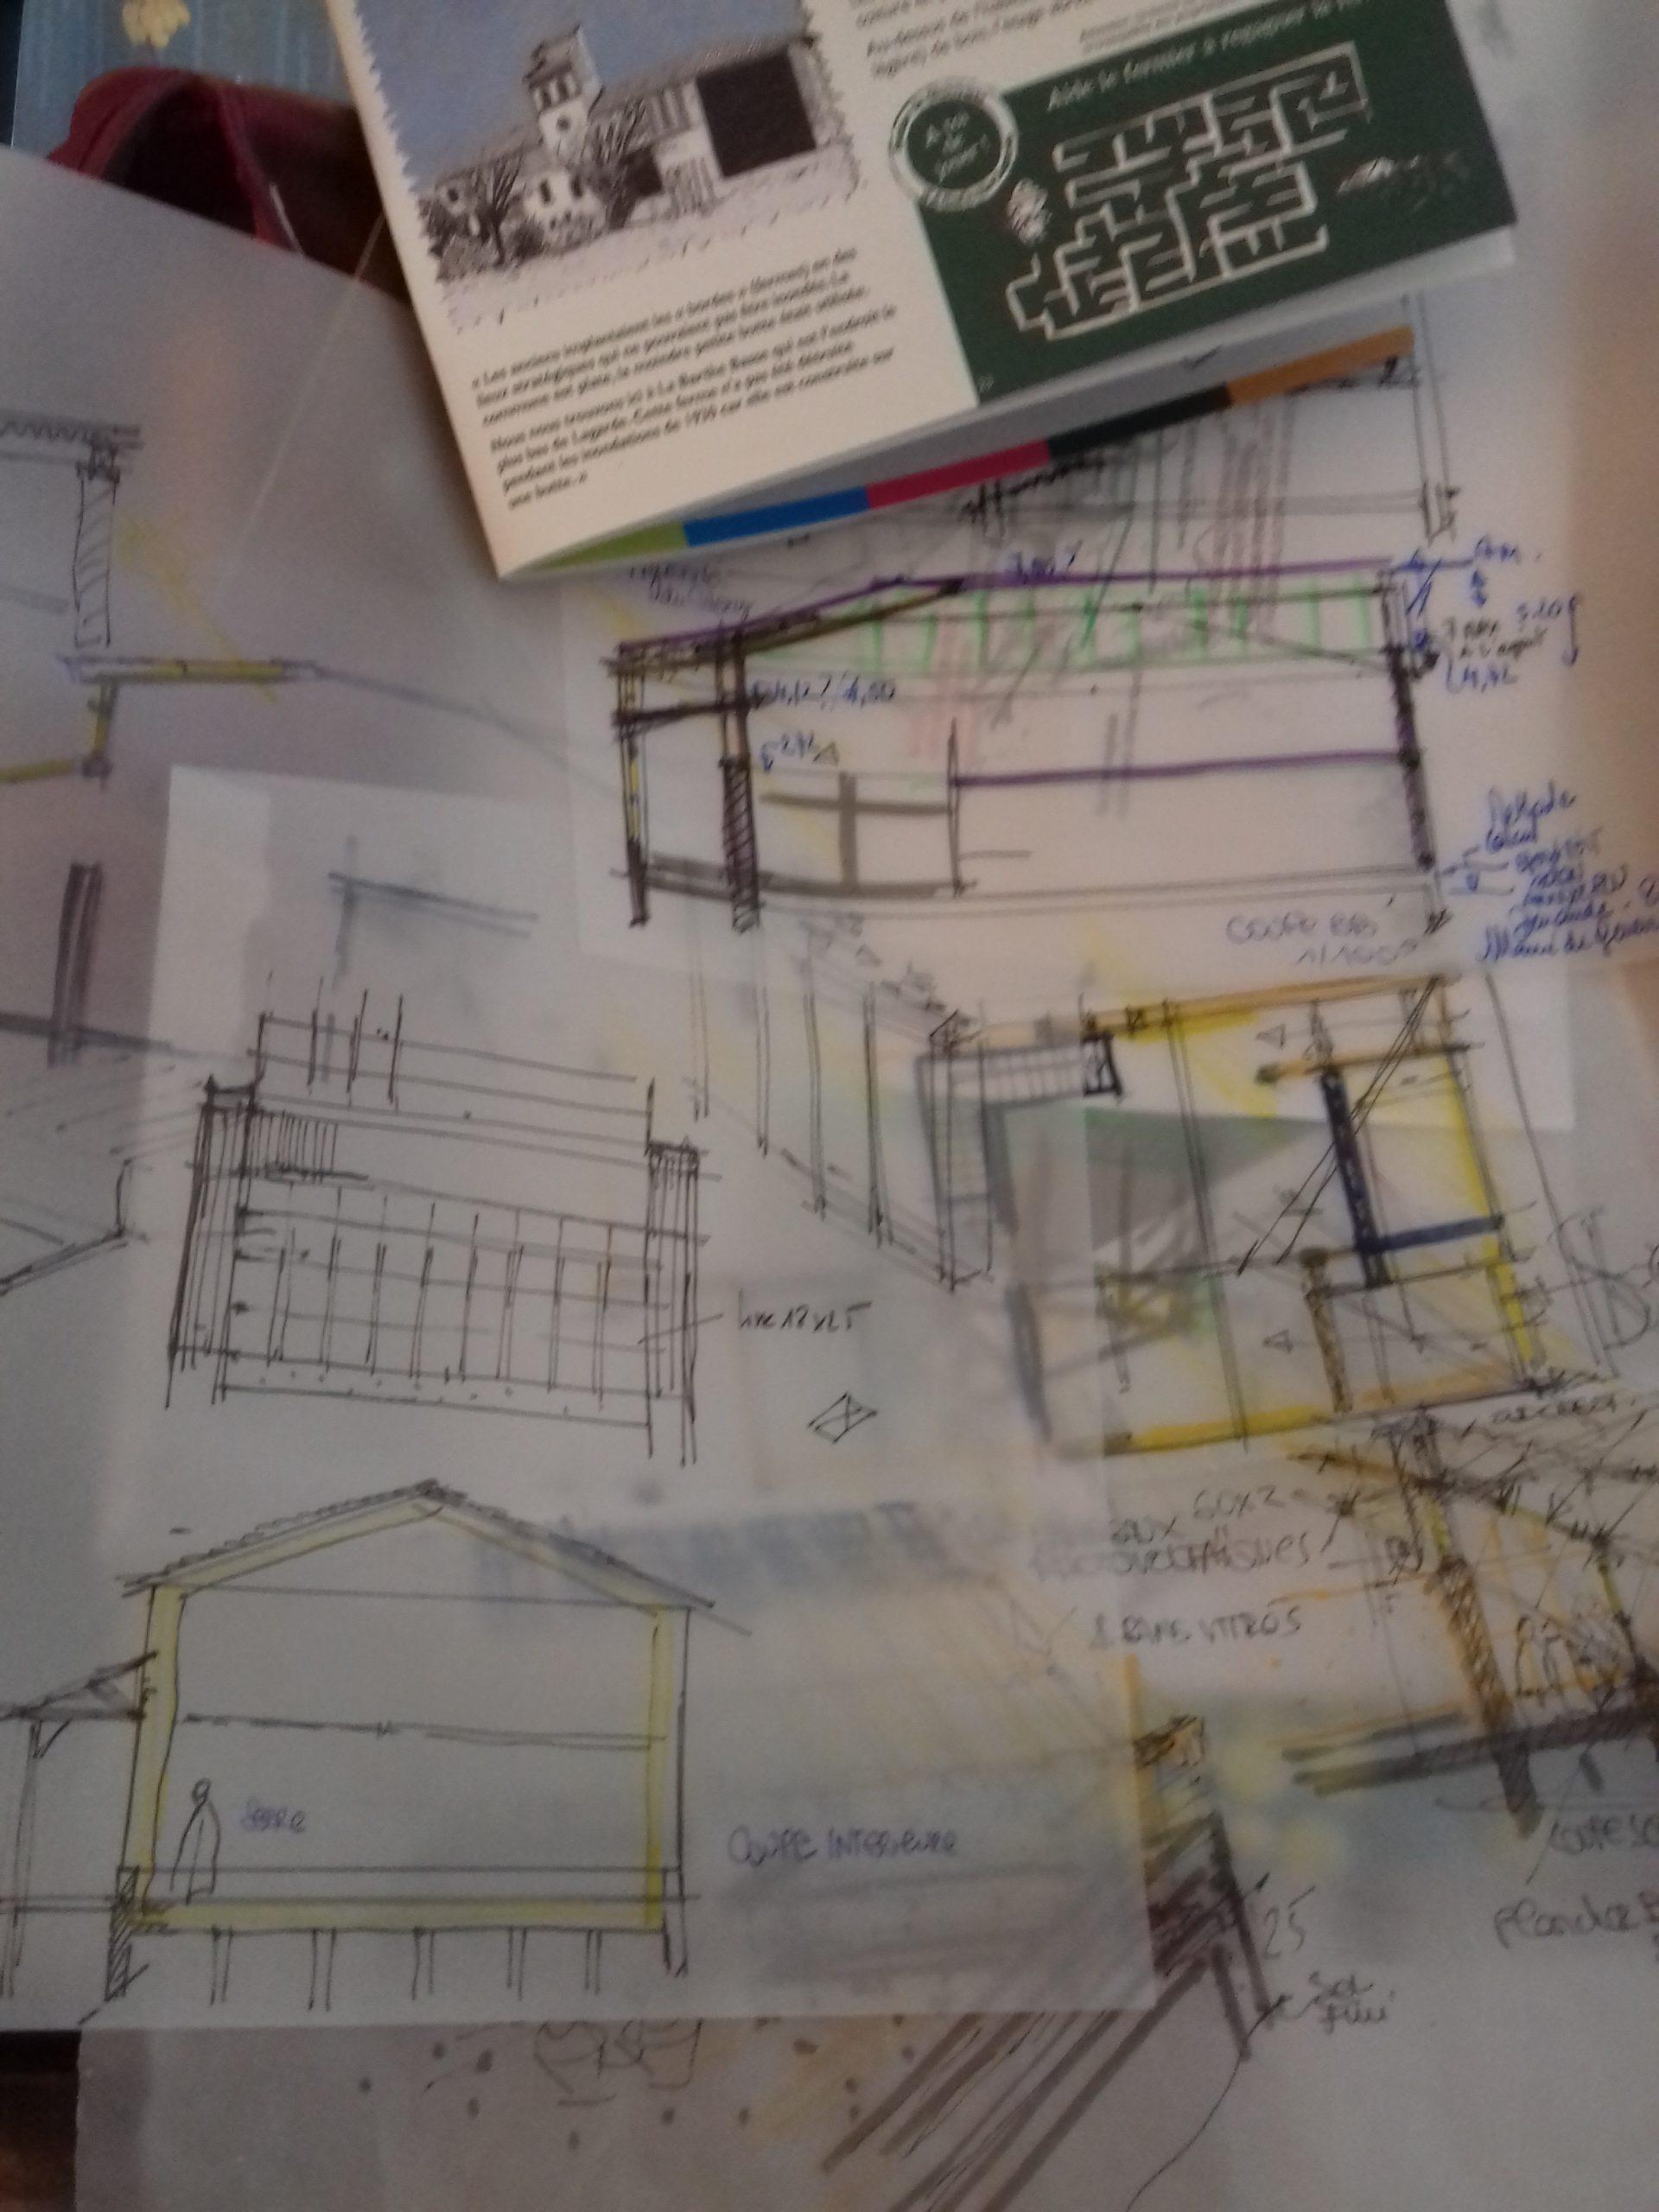 Affichage esquisse Tortelier E.Architecte DPLG 8 h dessiner l'urbain